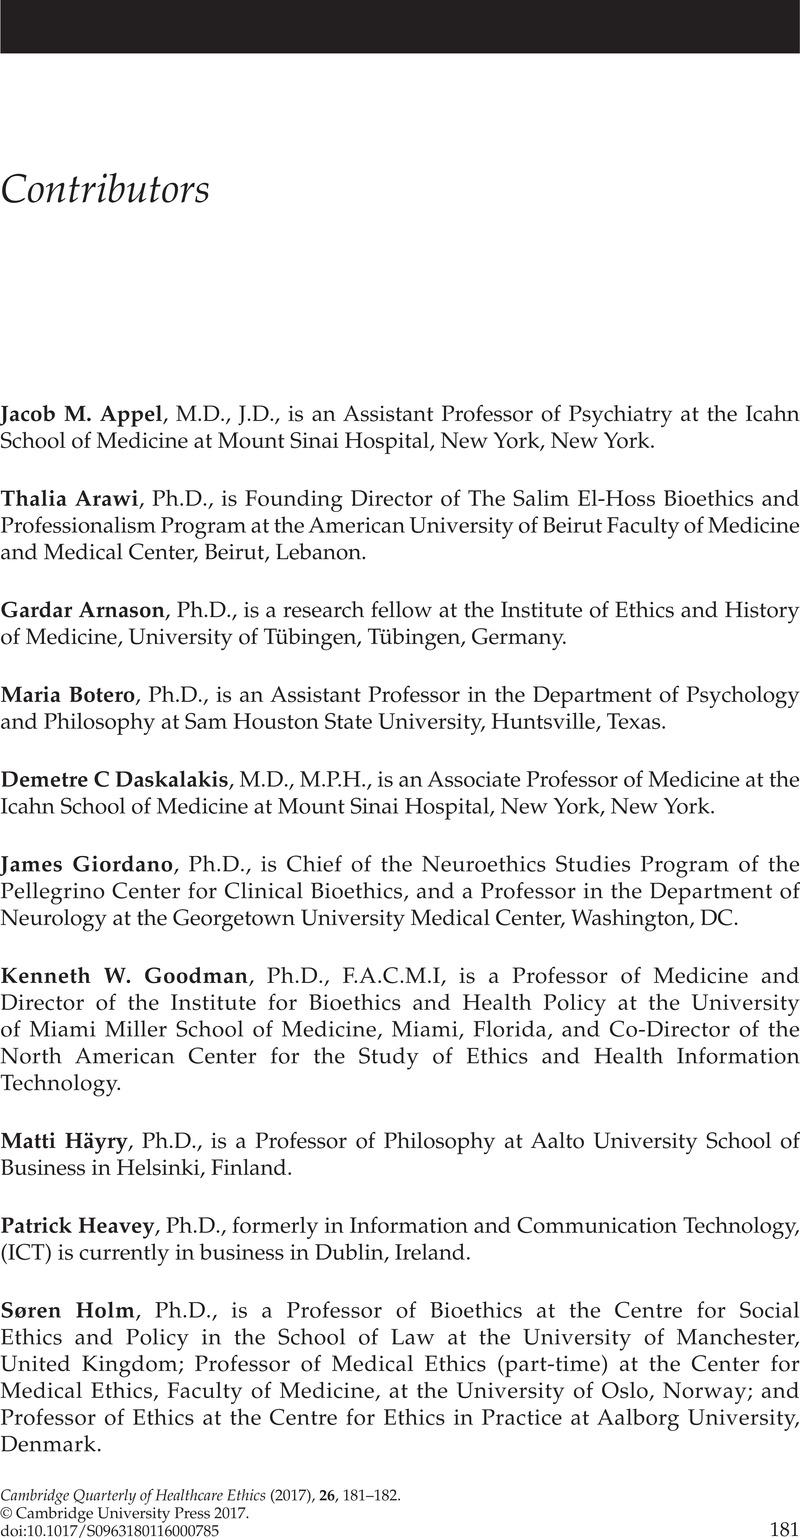 Contributors   Cambridge Quarterly of Healthcare Ethics